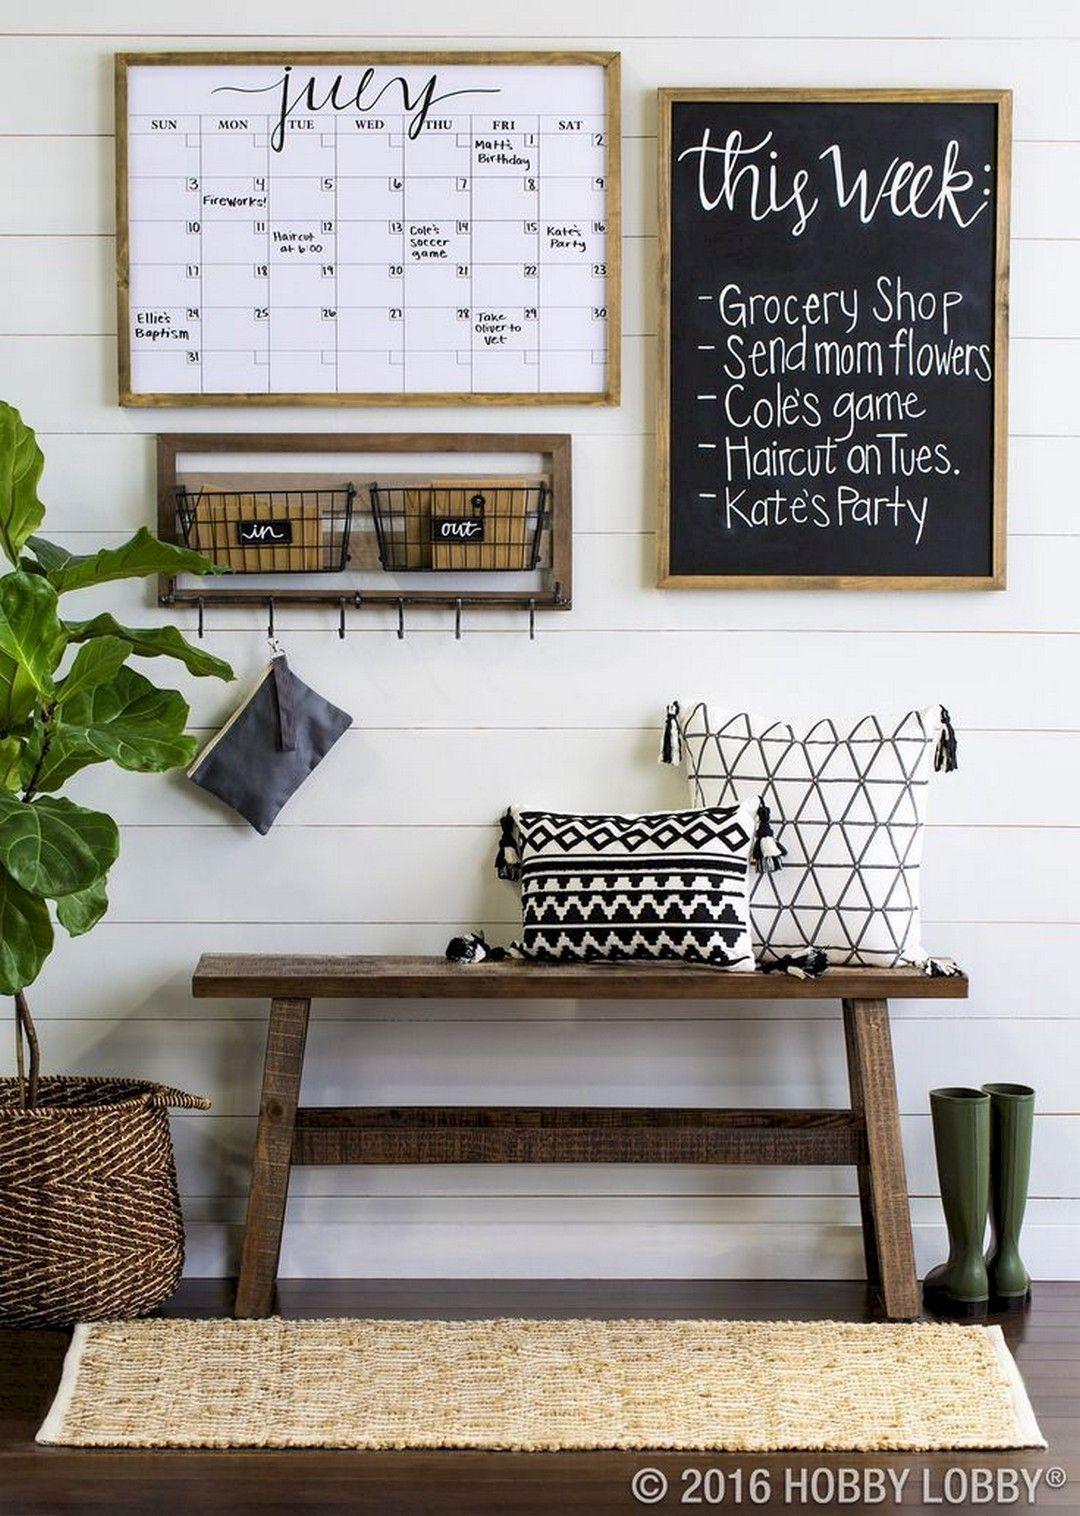 32 Apartment Aesthetic Decor On A Budget | Pinterest